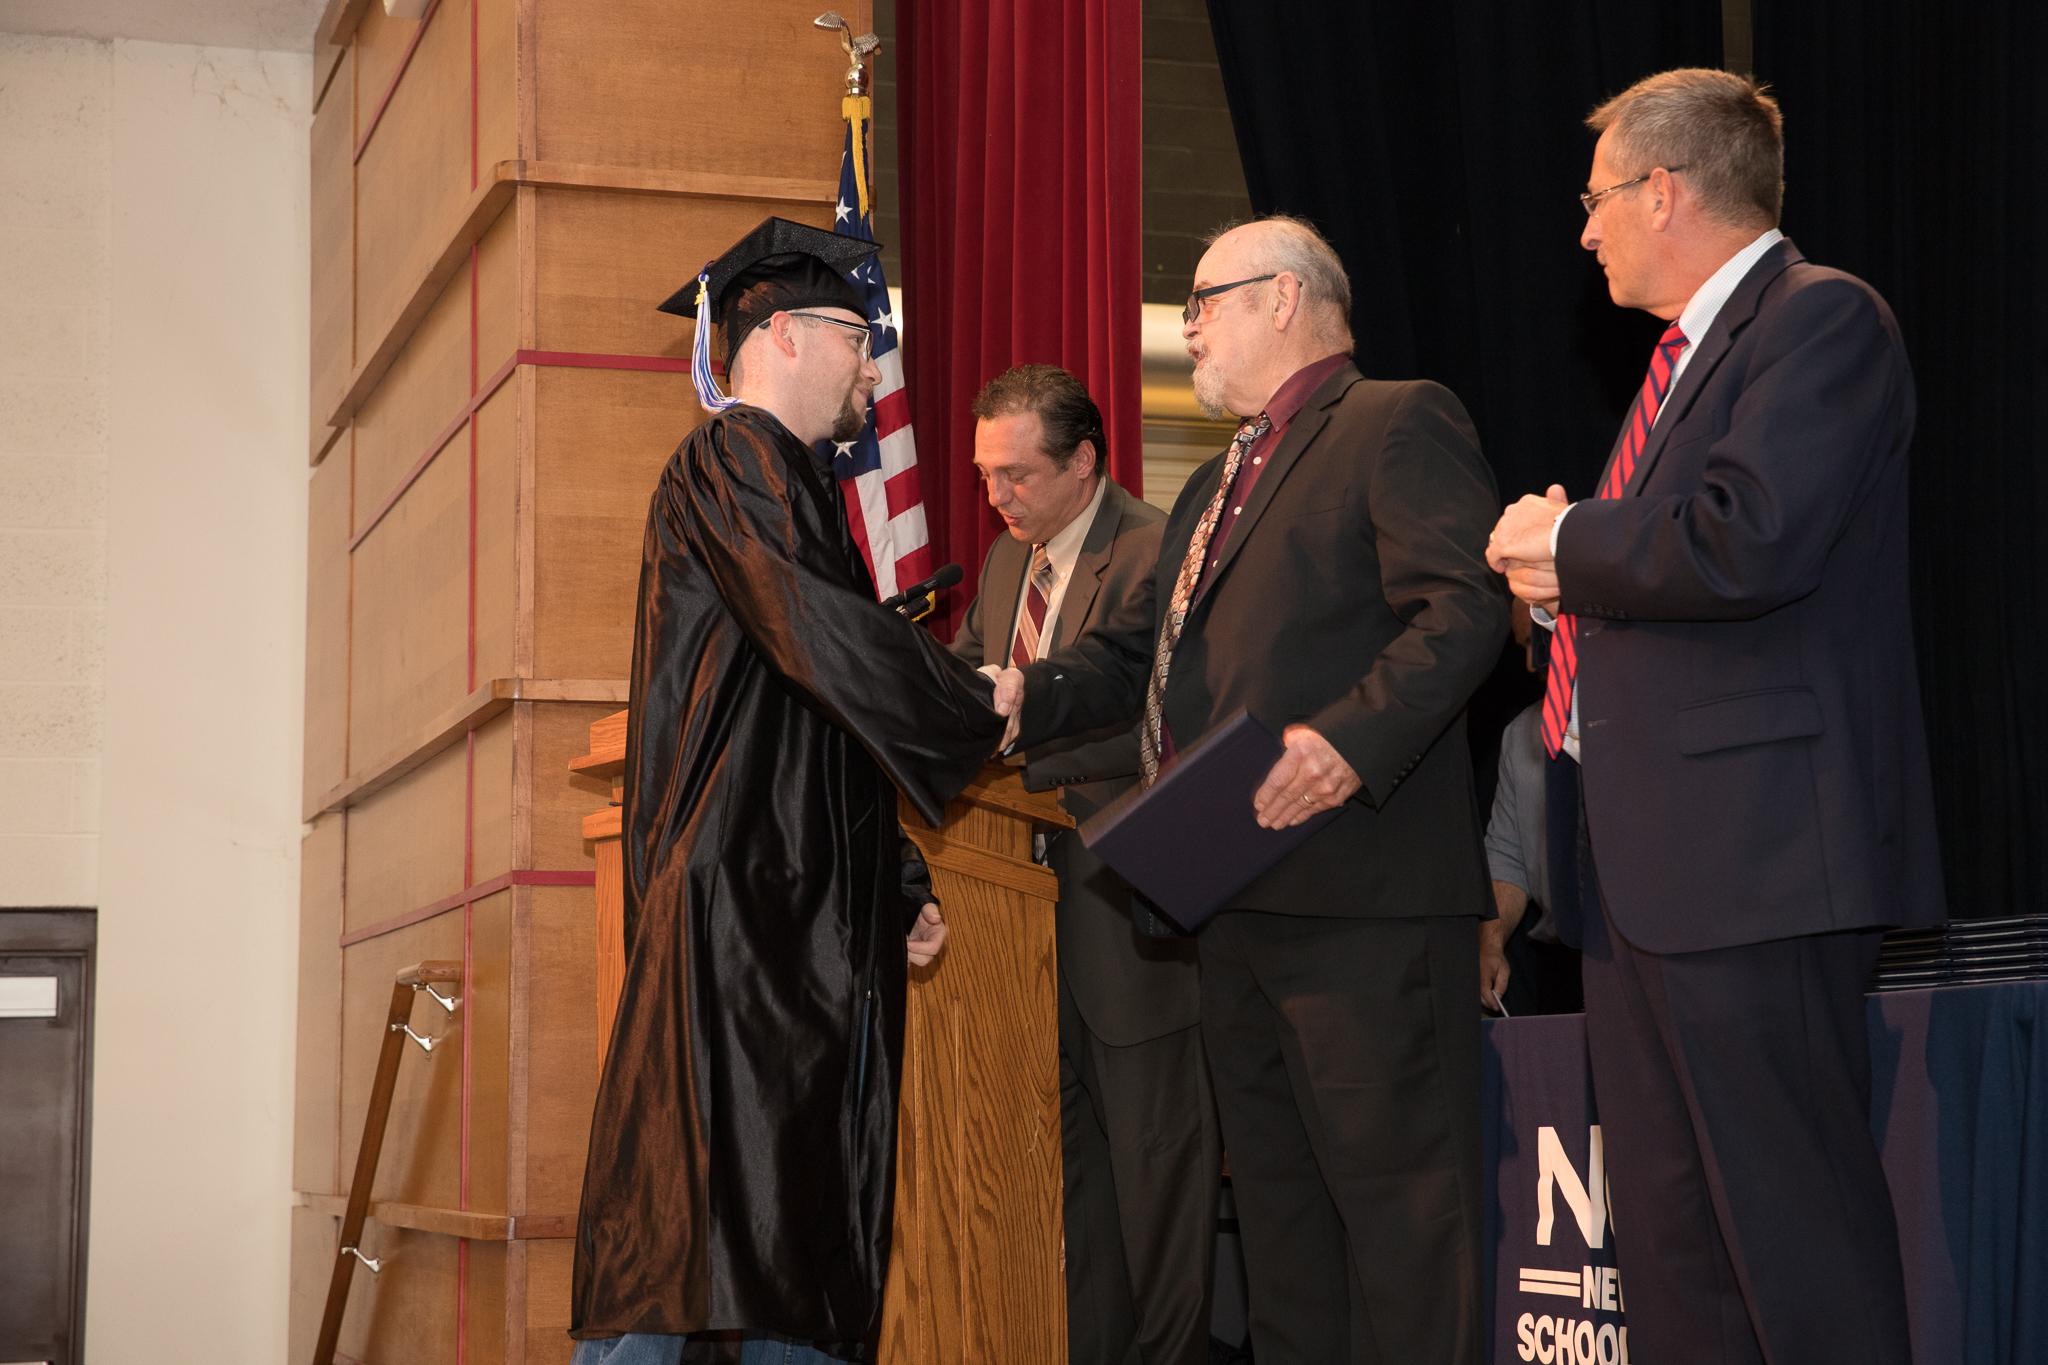 ncst_fall_2017_graduation-22.jpg